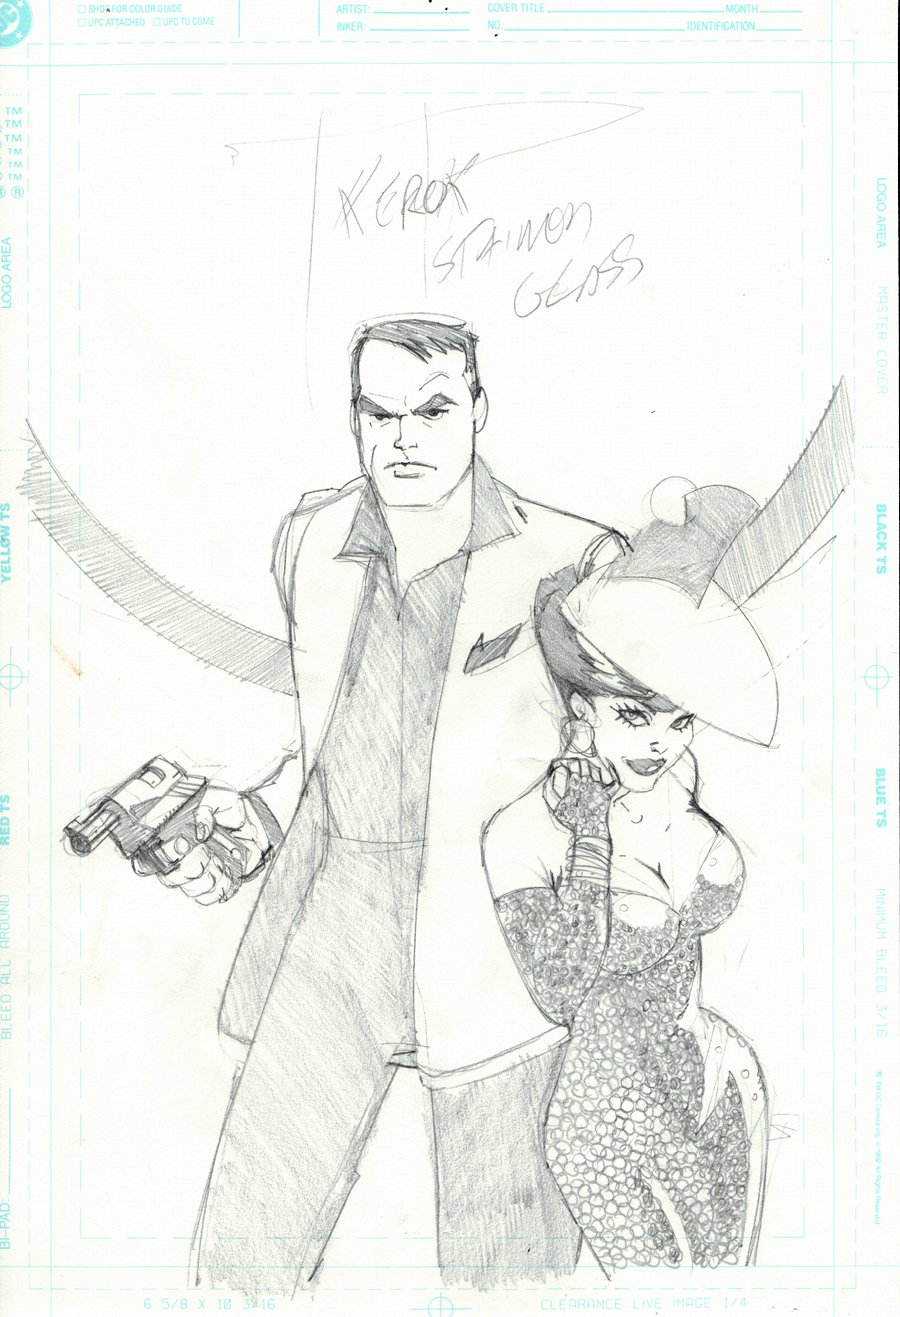 Pulp Fantastic #2 Unpublished Cover (1999)